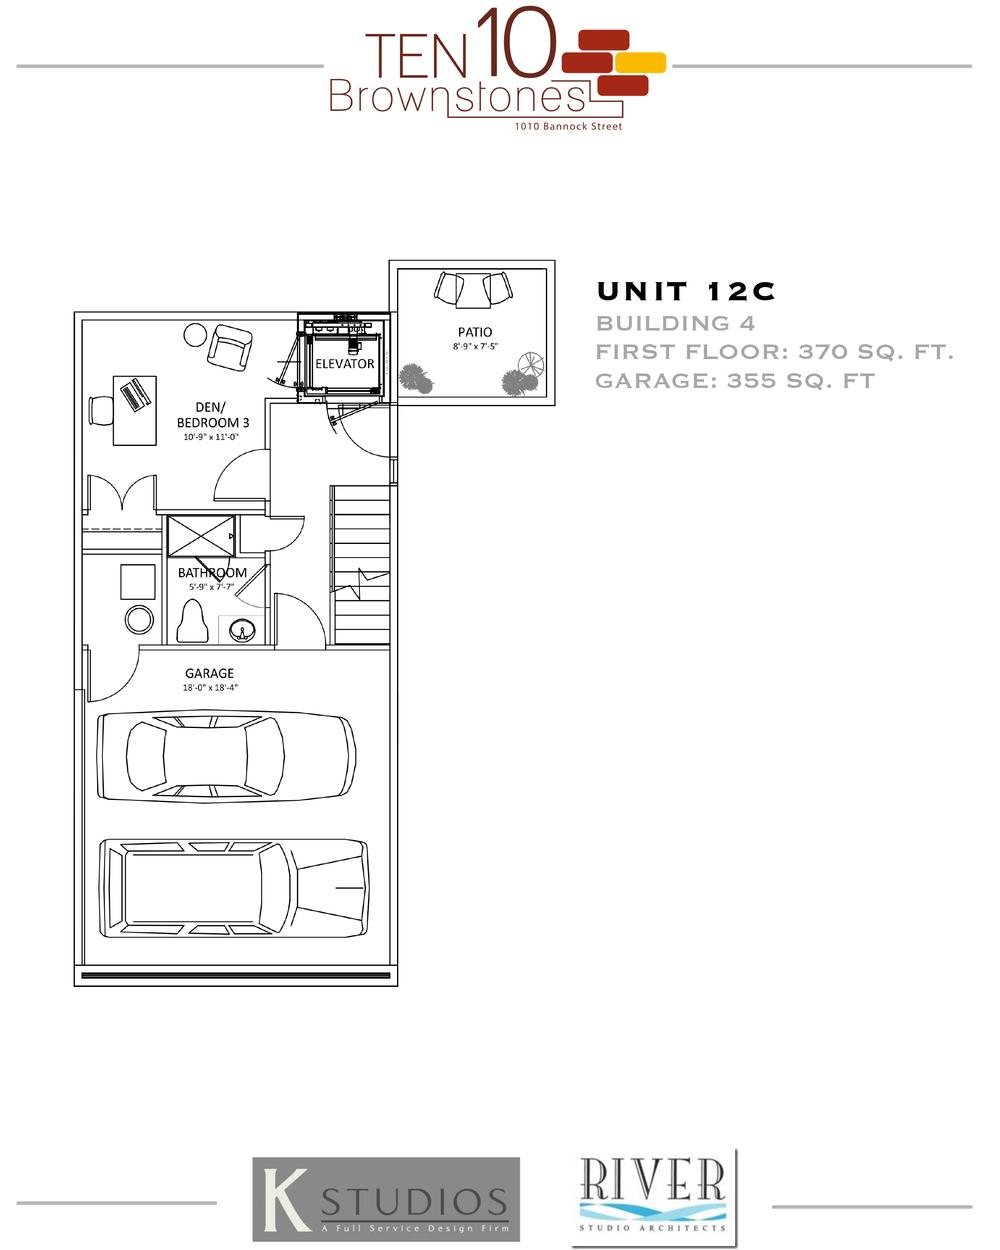 Click image to view & download Unit 12C floor plan